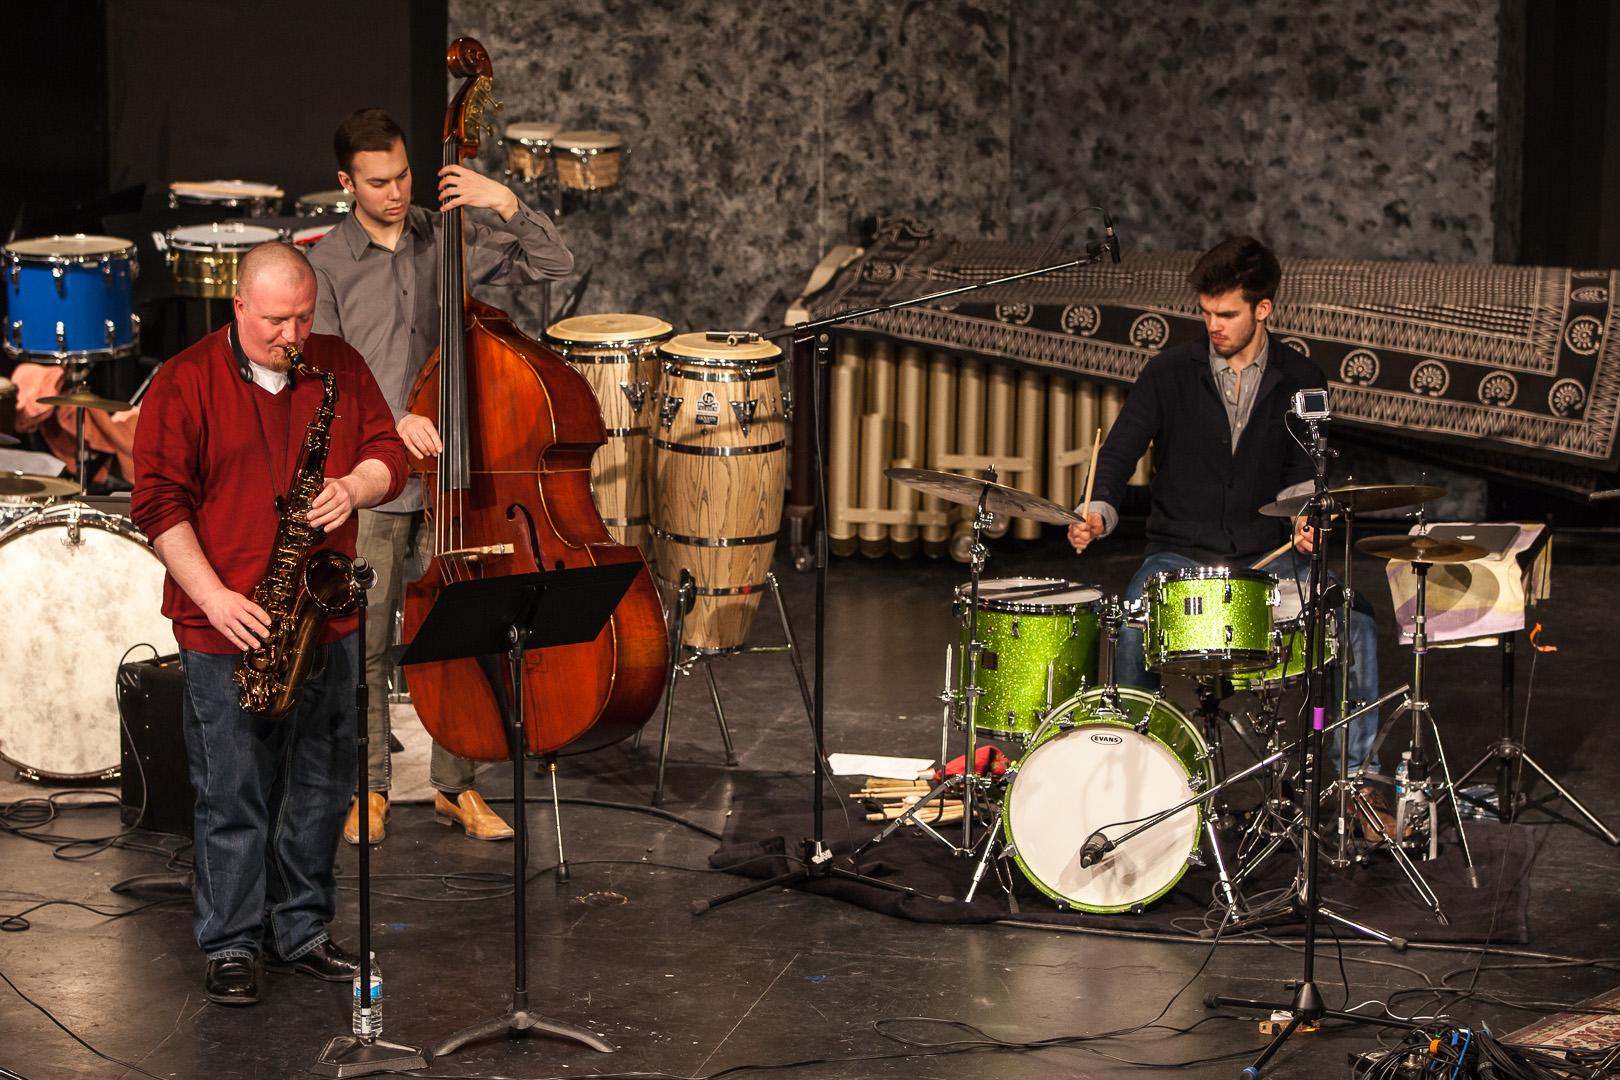 Lucas Sader  performing with  Paul Balcain  and  Karl Kohut  at the  2014 Winnipeg DrumTalk Festival . Photo credit:  Matt Duboff .